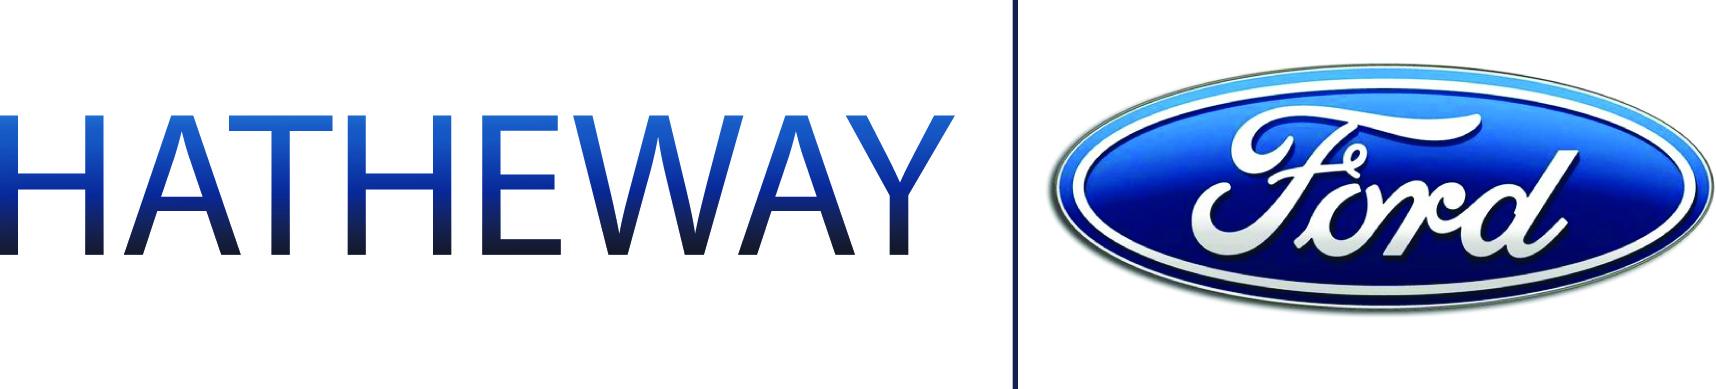 Hatheway Limited